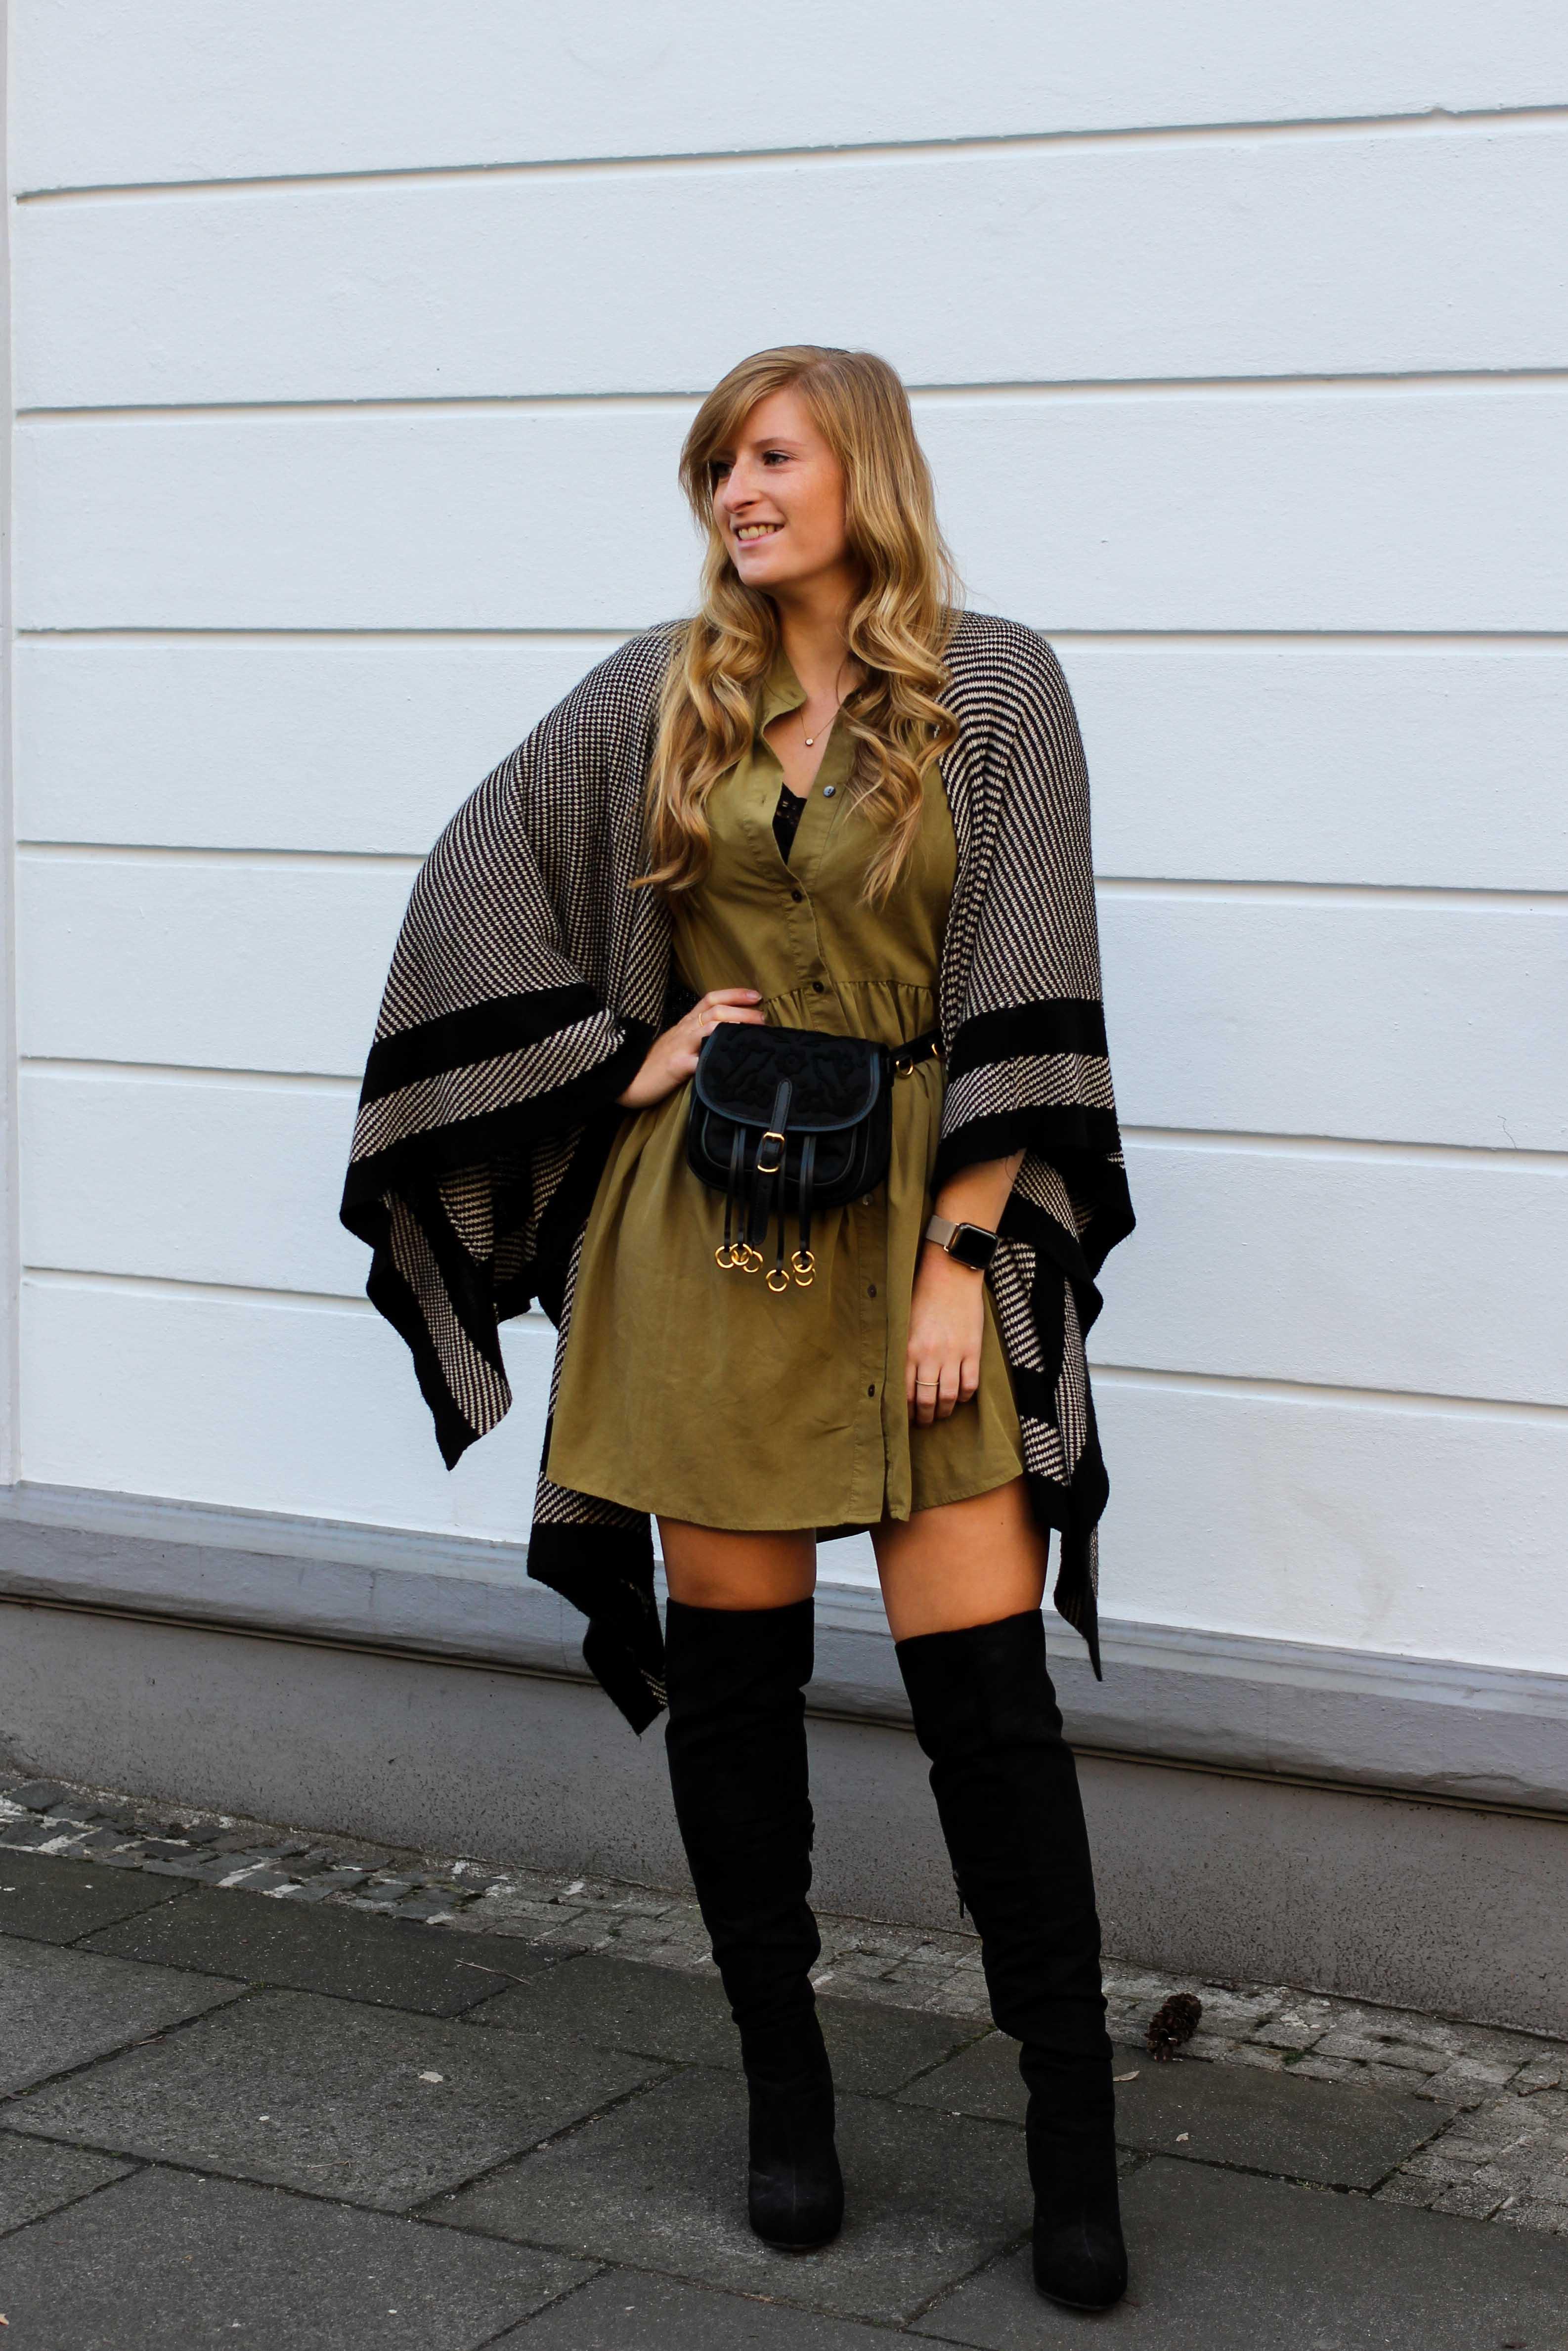 Overknees Gürteltasche Prada Poncho Second-Hand Kleidung kombinieren Streetstyle Outfit Bonn Zara Kleid grün Frühling 2019 1